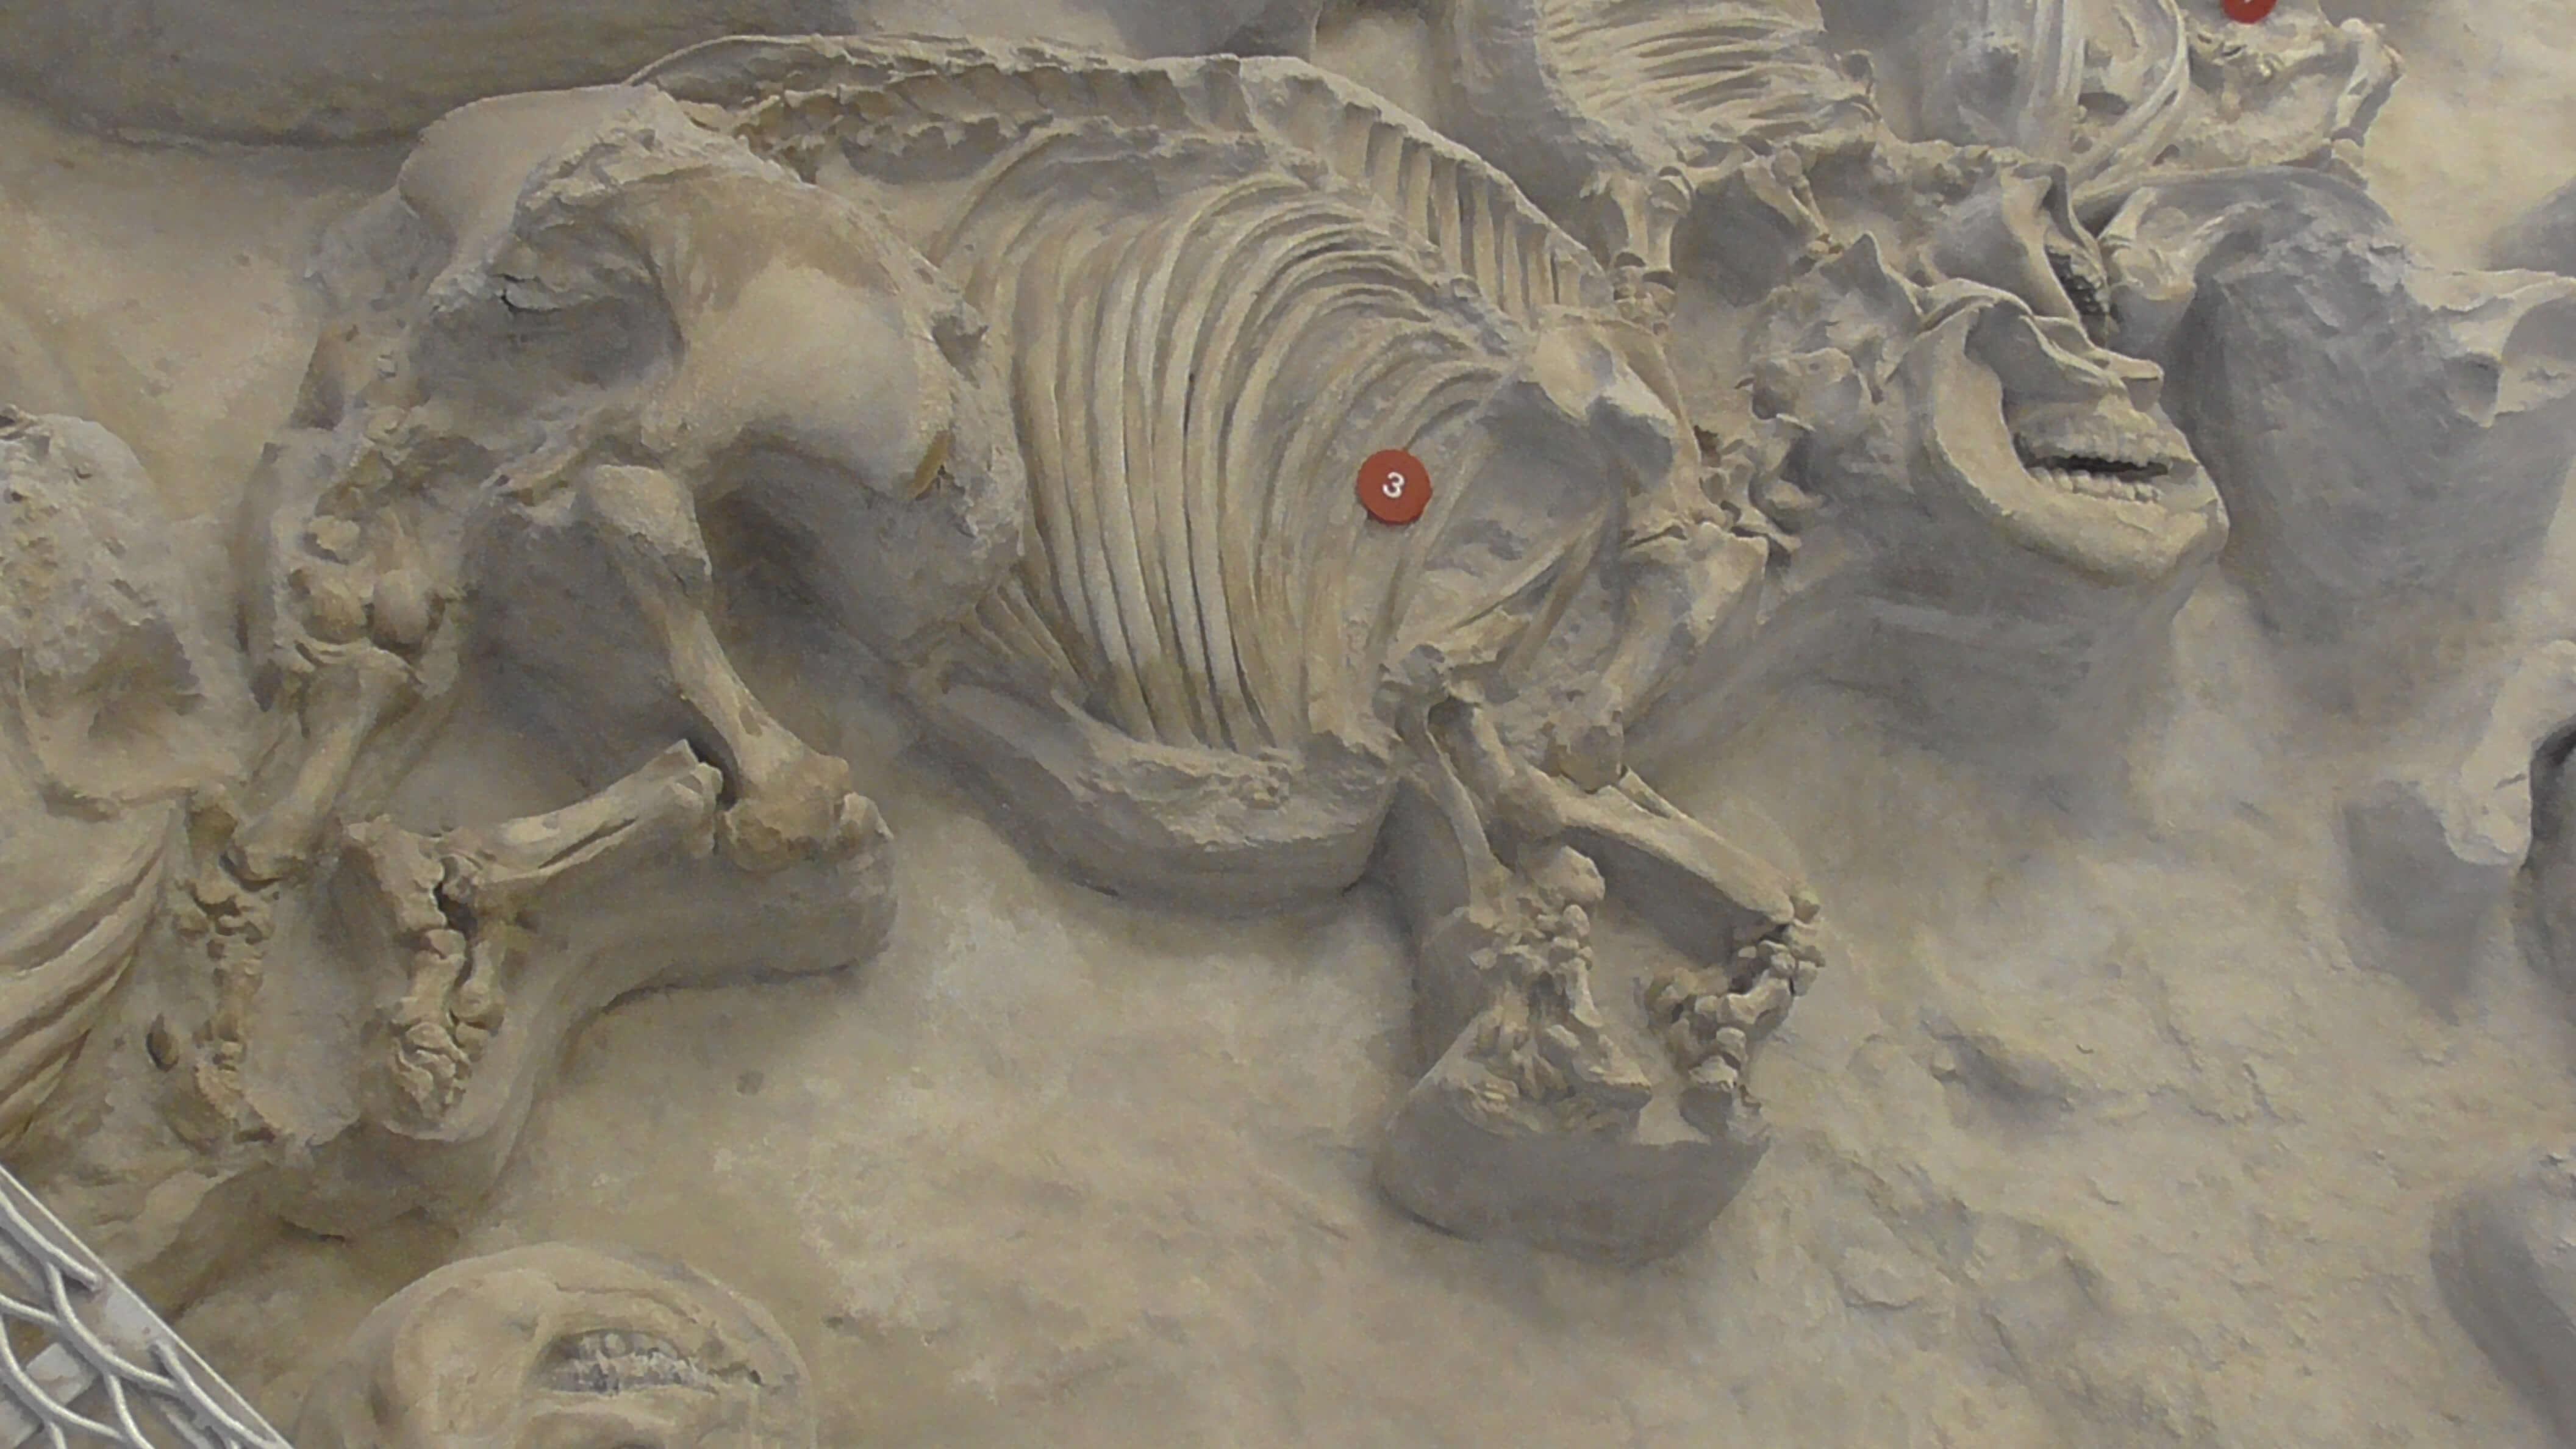 Barrel bodied Rhino skeleton